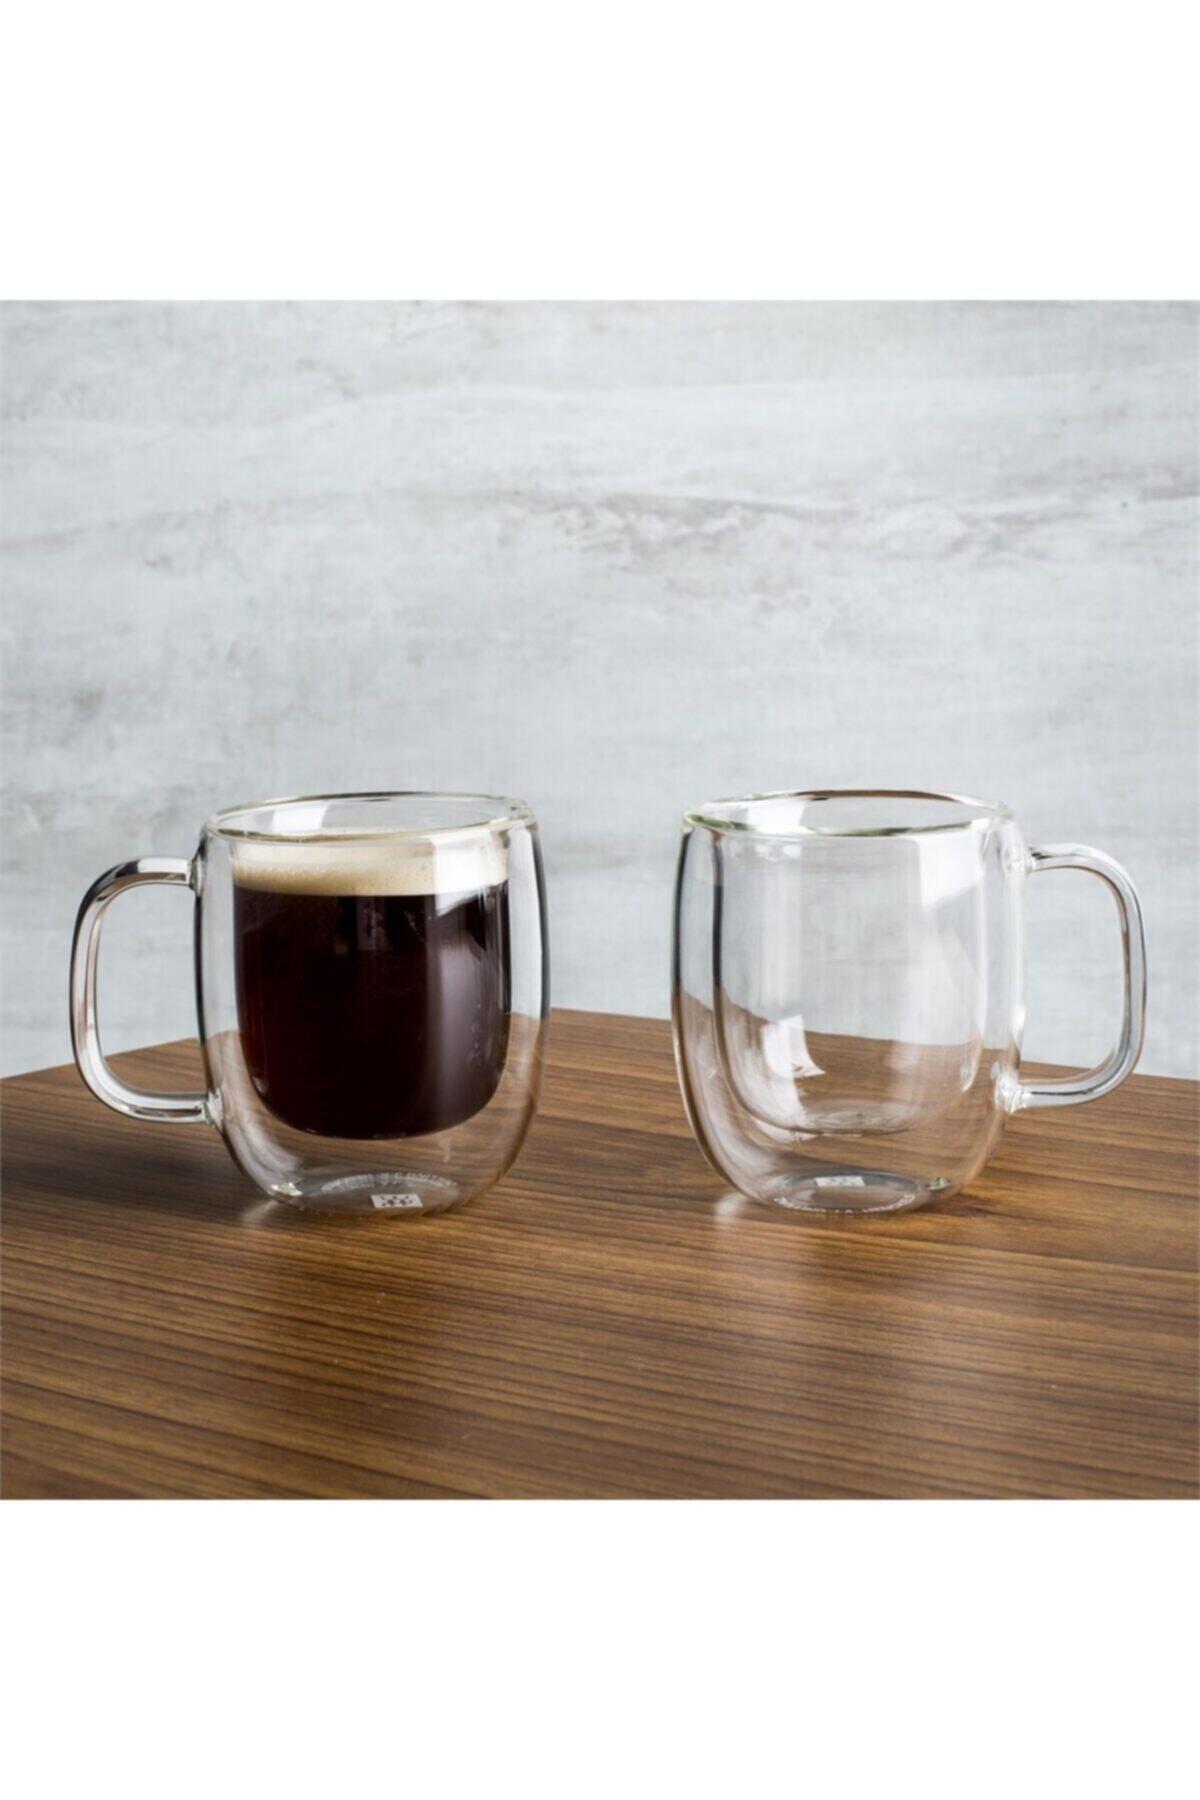 ZWILLING Beyaz 395001110 Çift Camlı Kulplu Espresso 2li Bardak 2